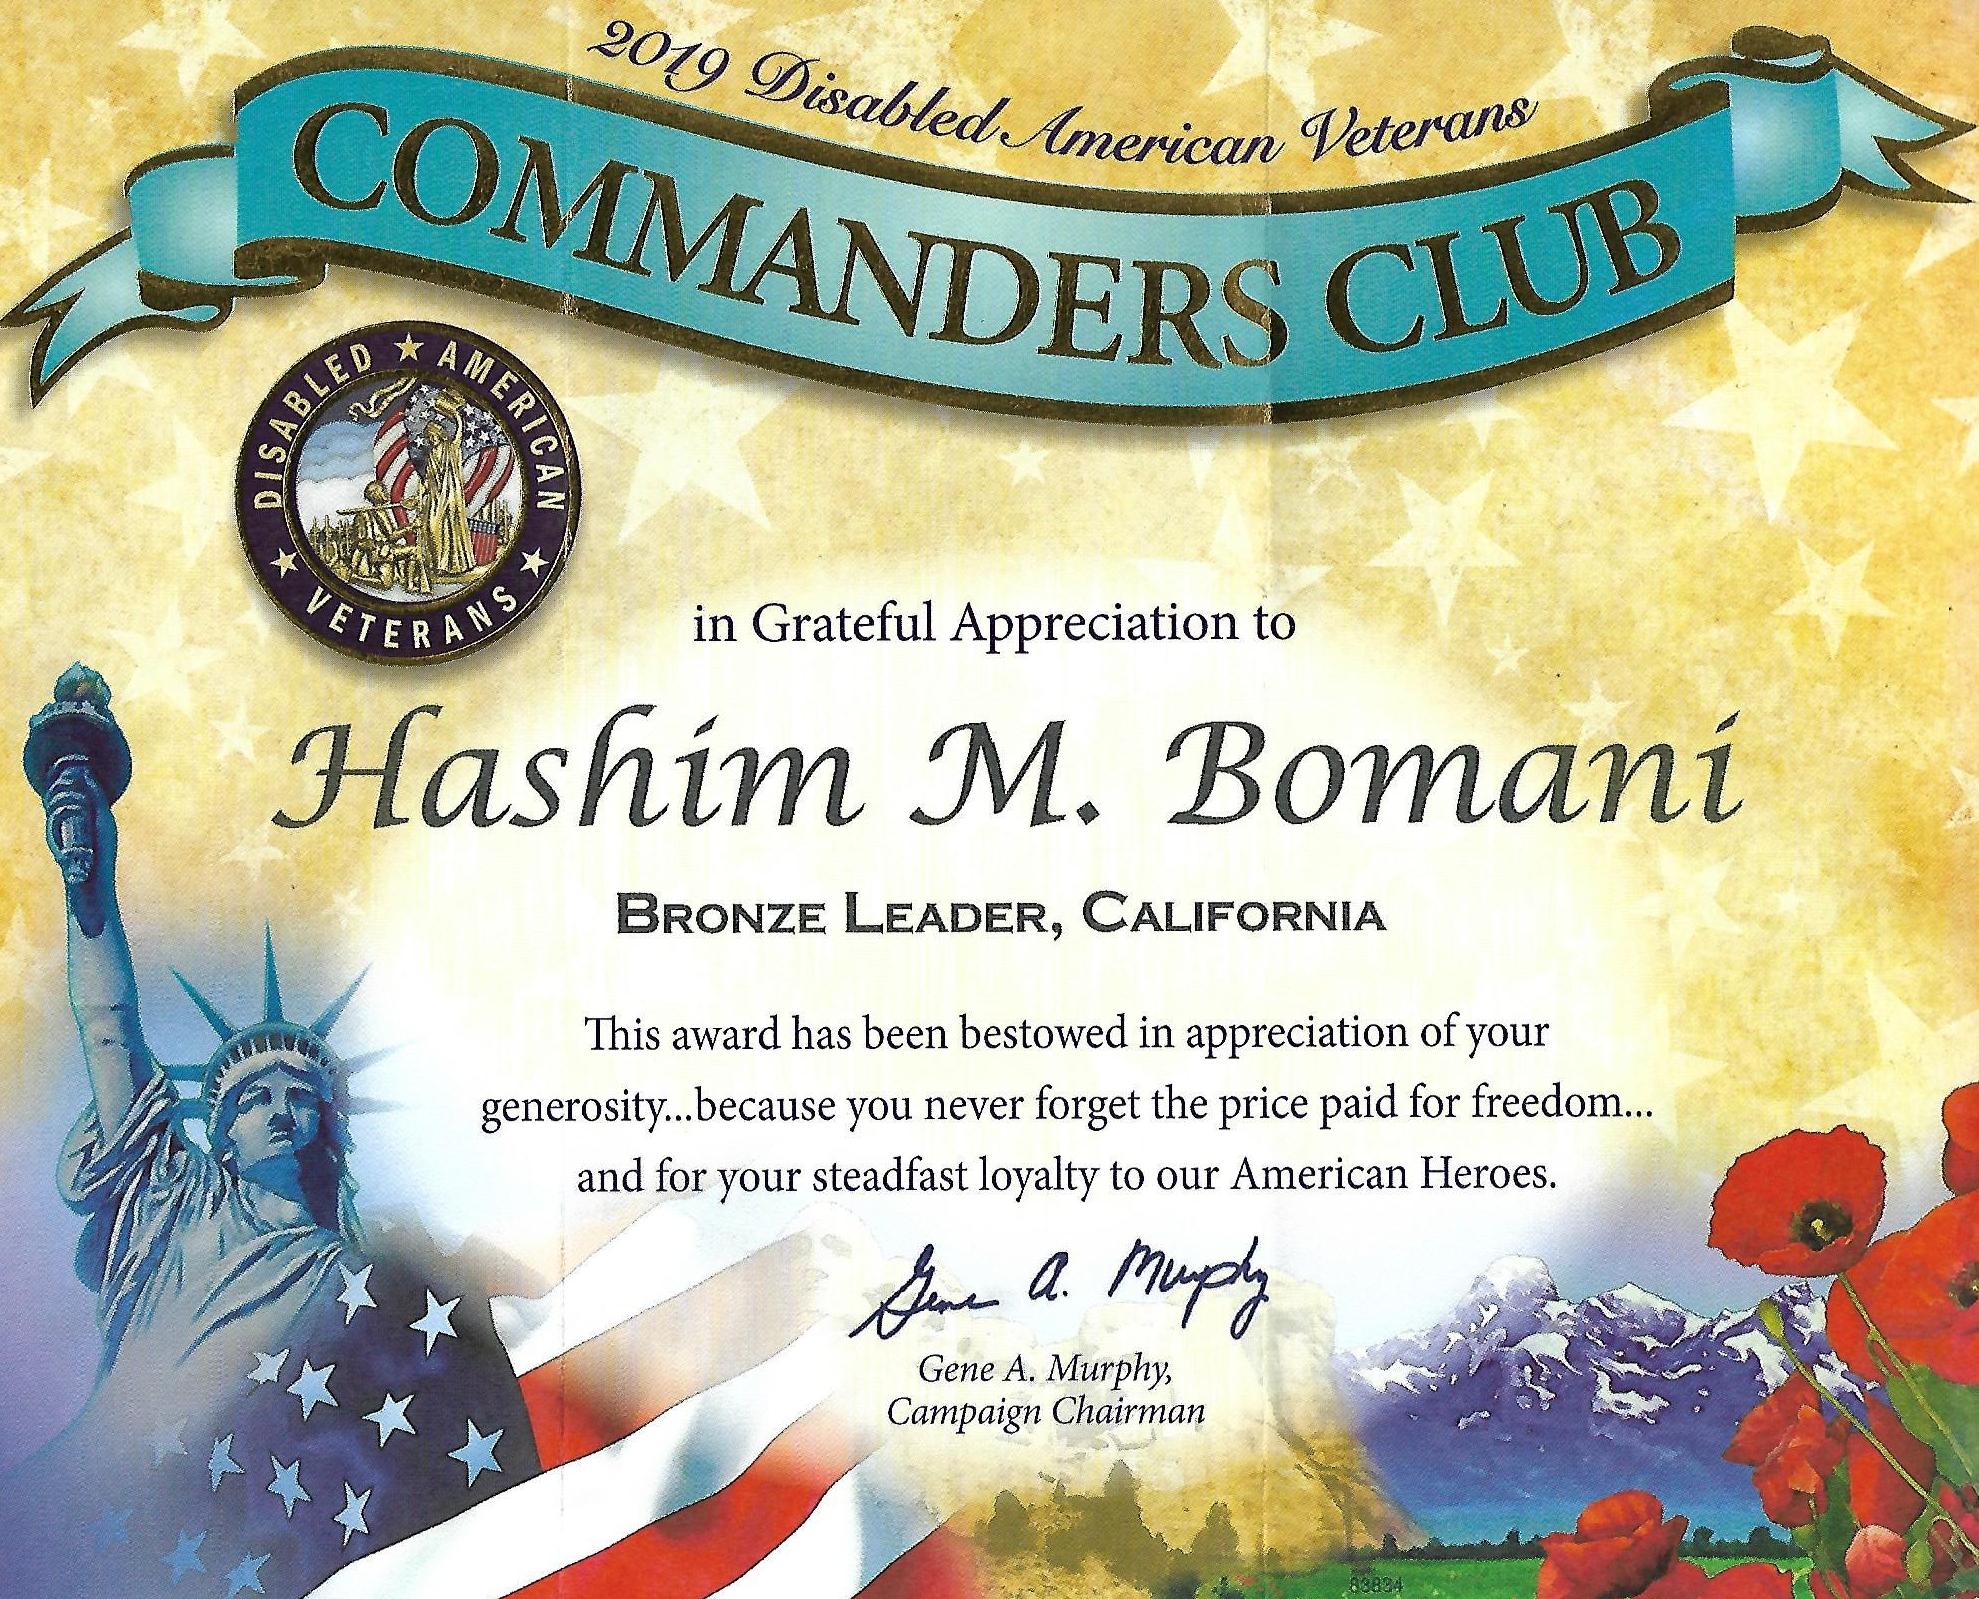 command club2019